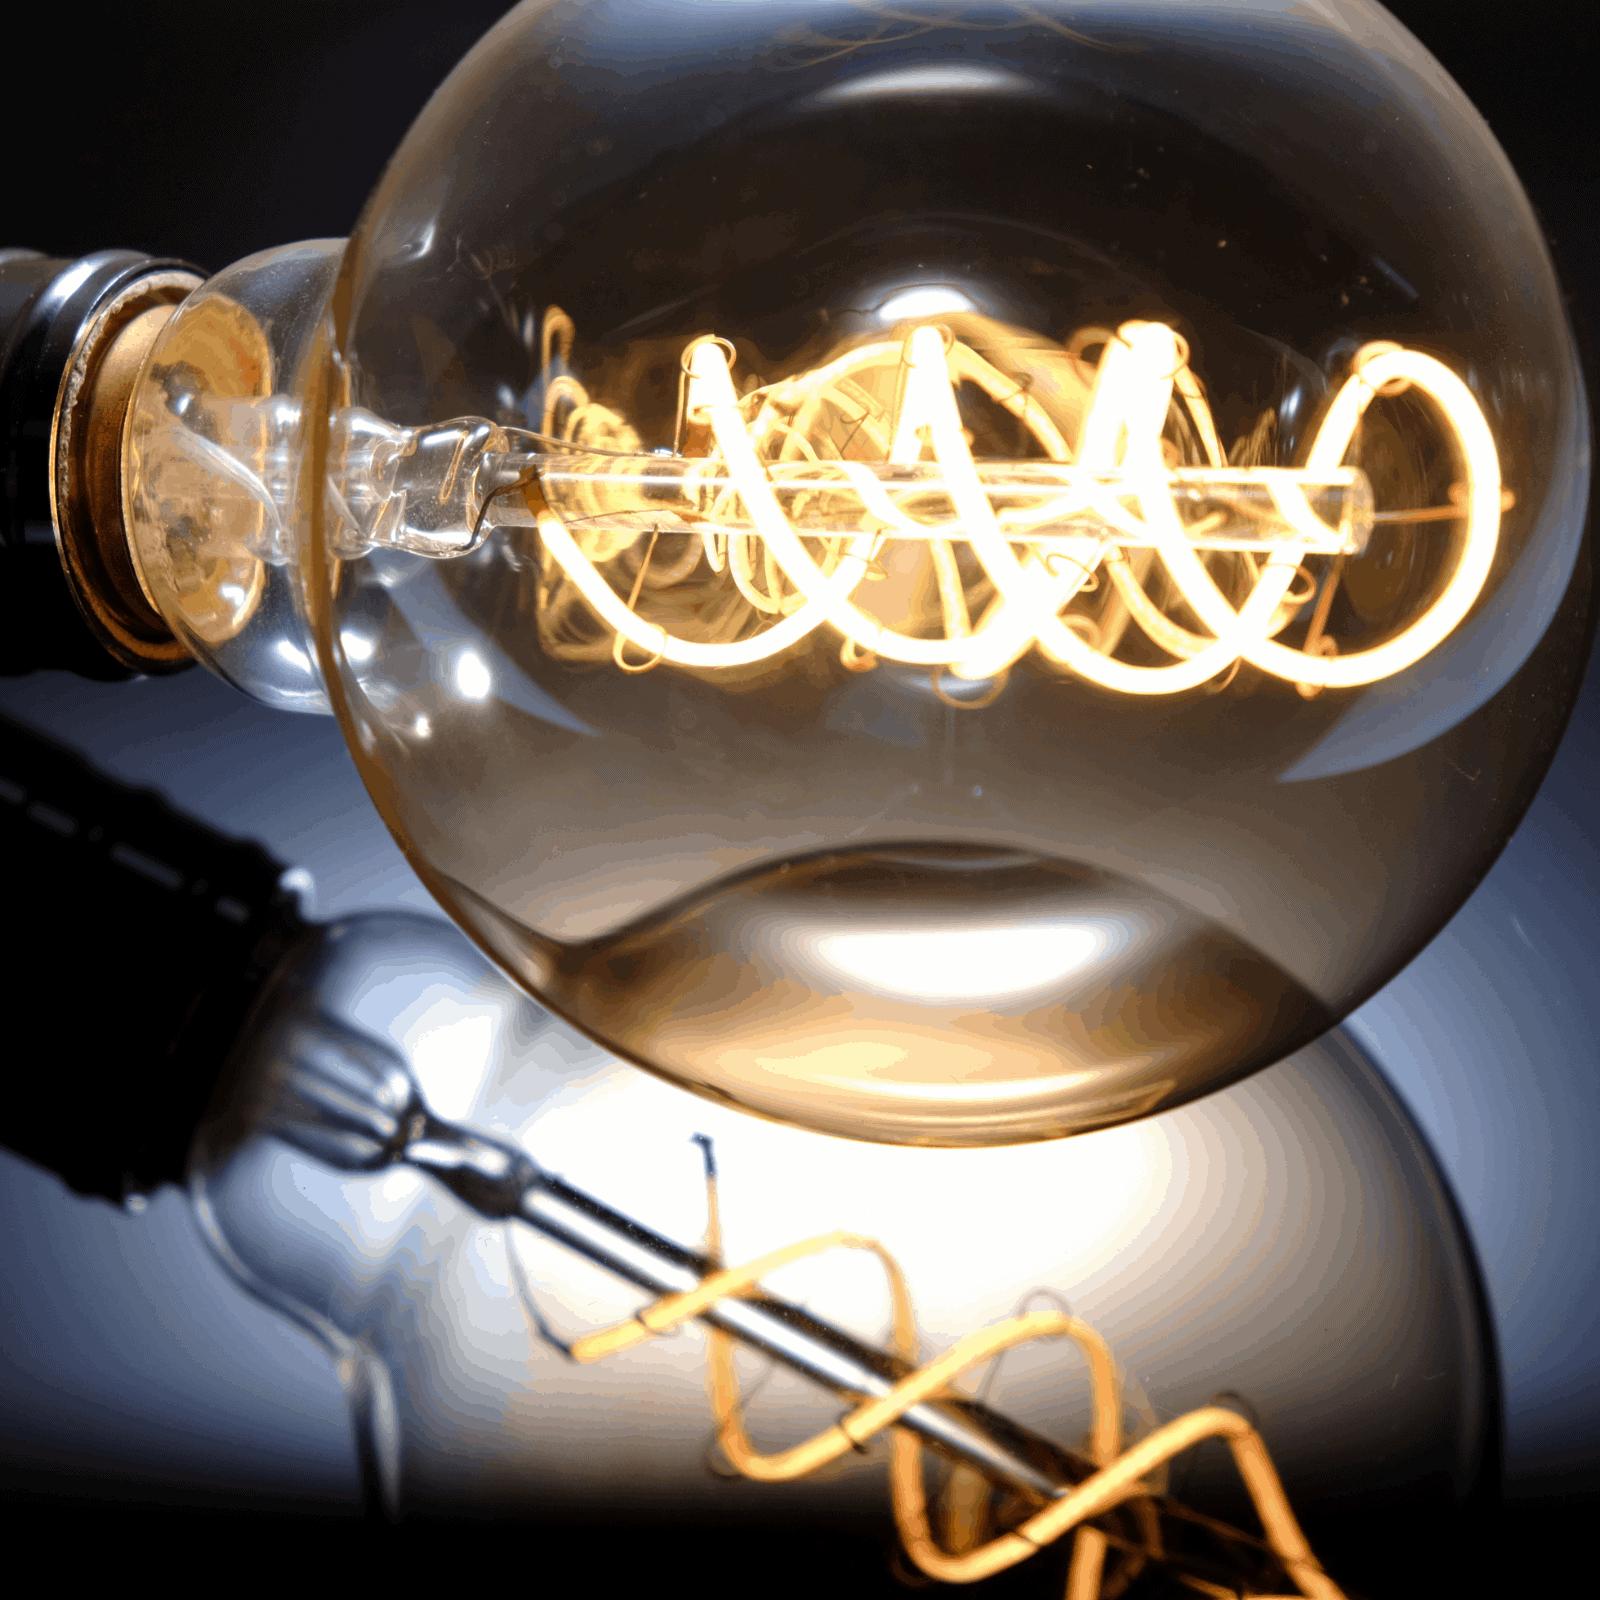 NTE Podcast: Electrify Everything